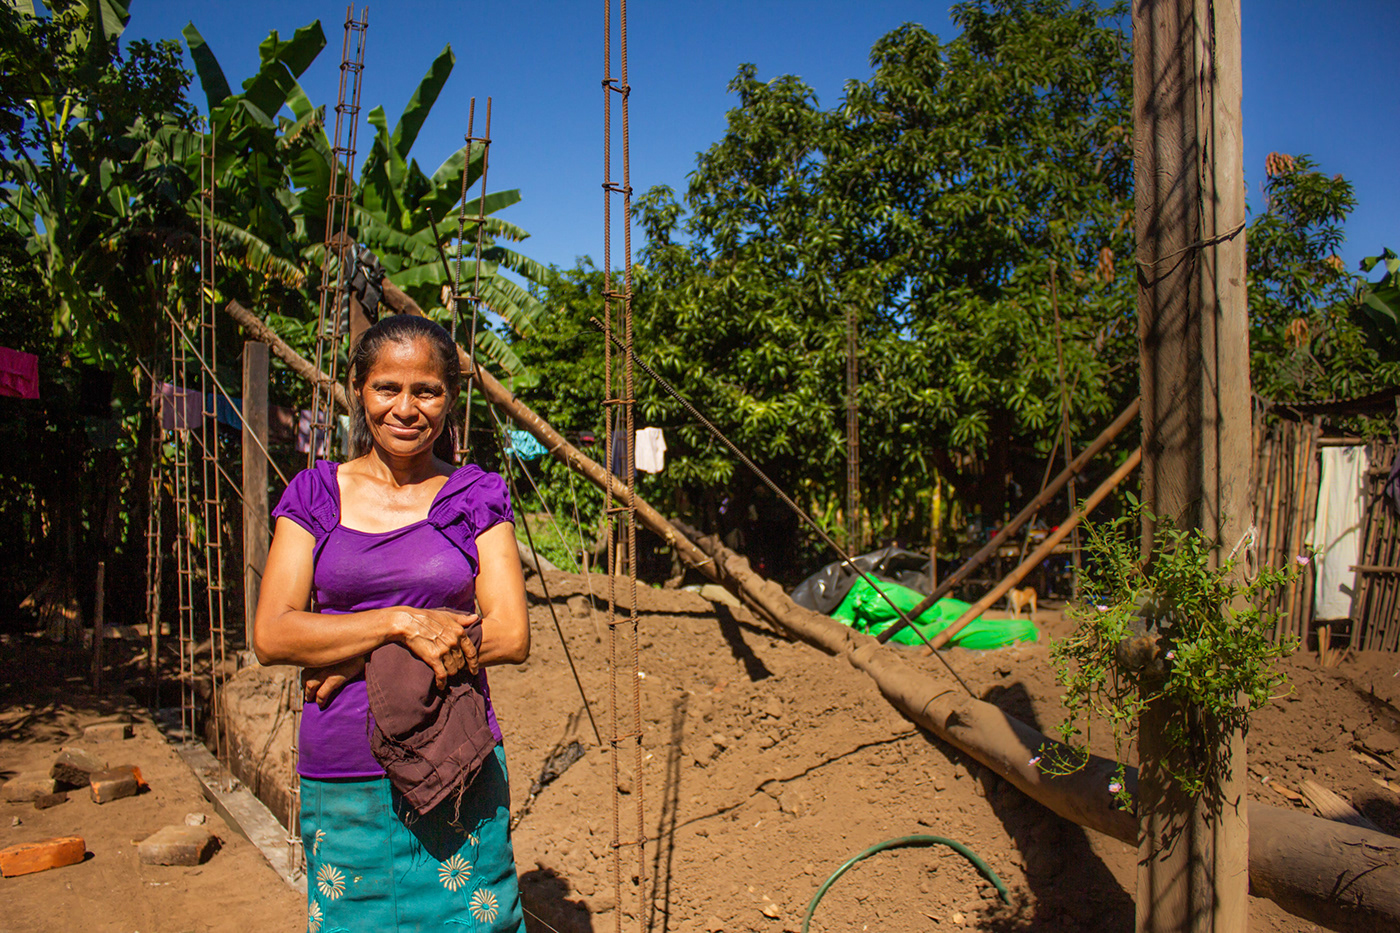 Fotografía Documental mujeres rurales nicaragua non-profit photography ong rural photography women